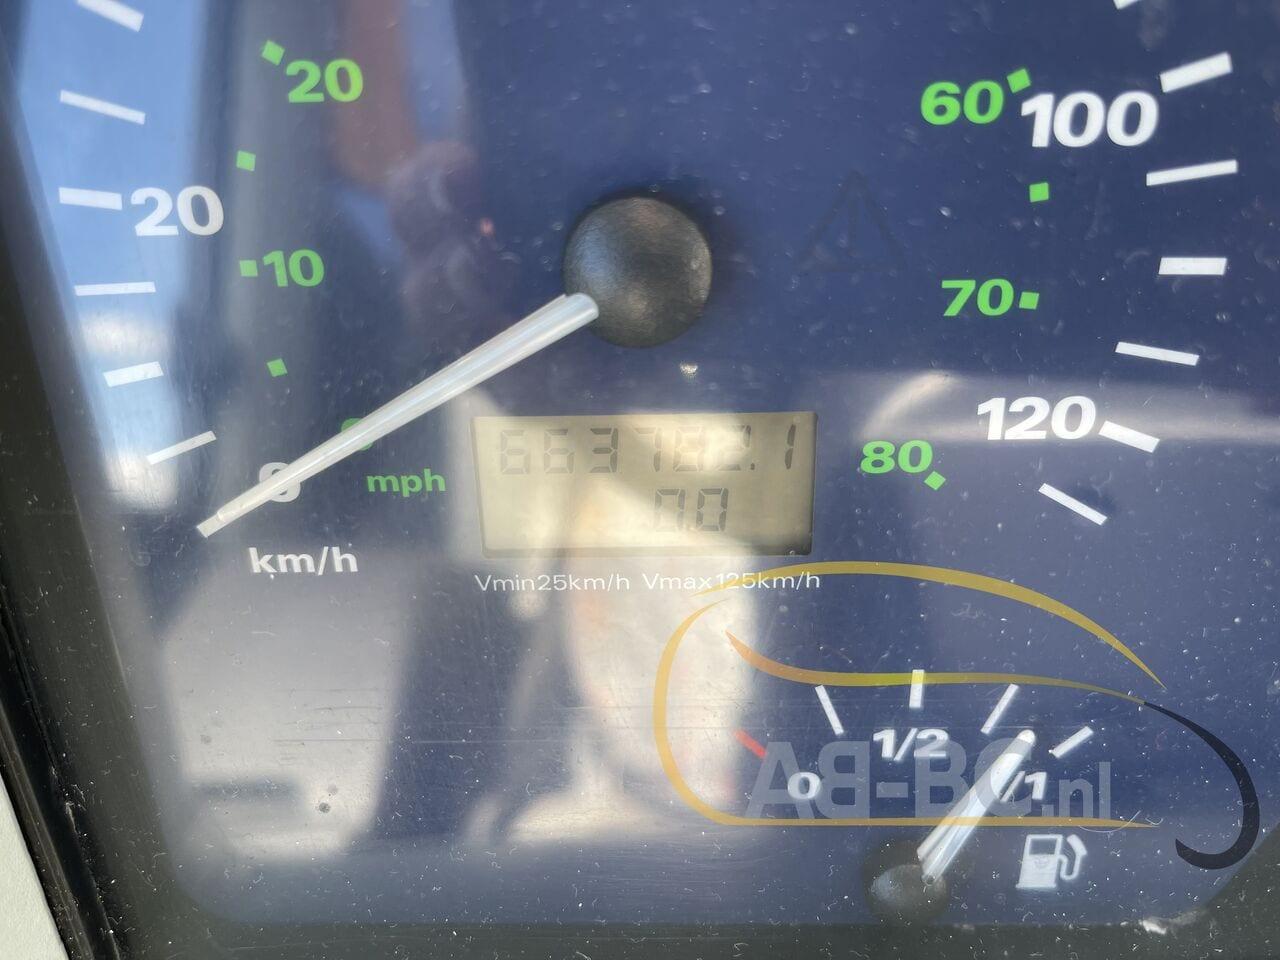 coach-busTEMSA-Safari-RD-53-Seats-DAF-Motor-12-mtr---1616166749057042260_big_66763e4dced47fa14c58ad7ba5c6f721--21031917053743807500